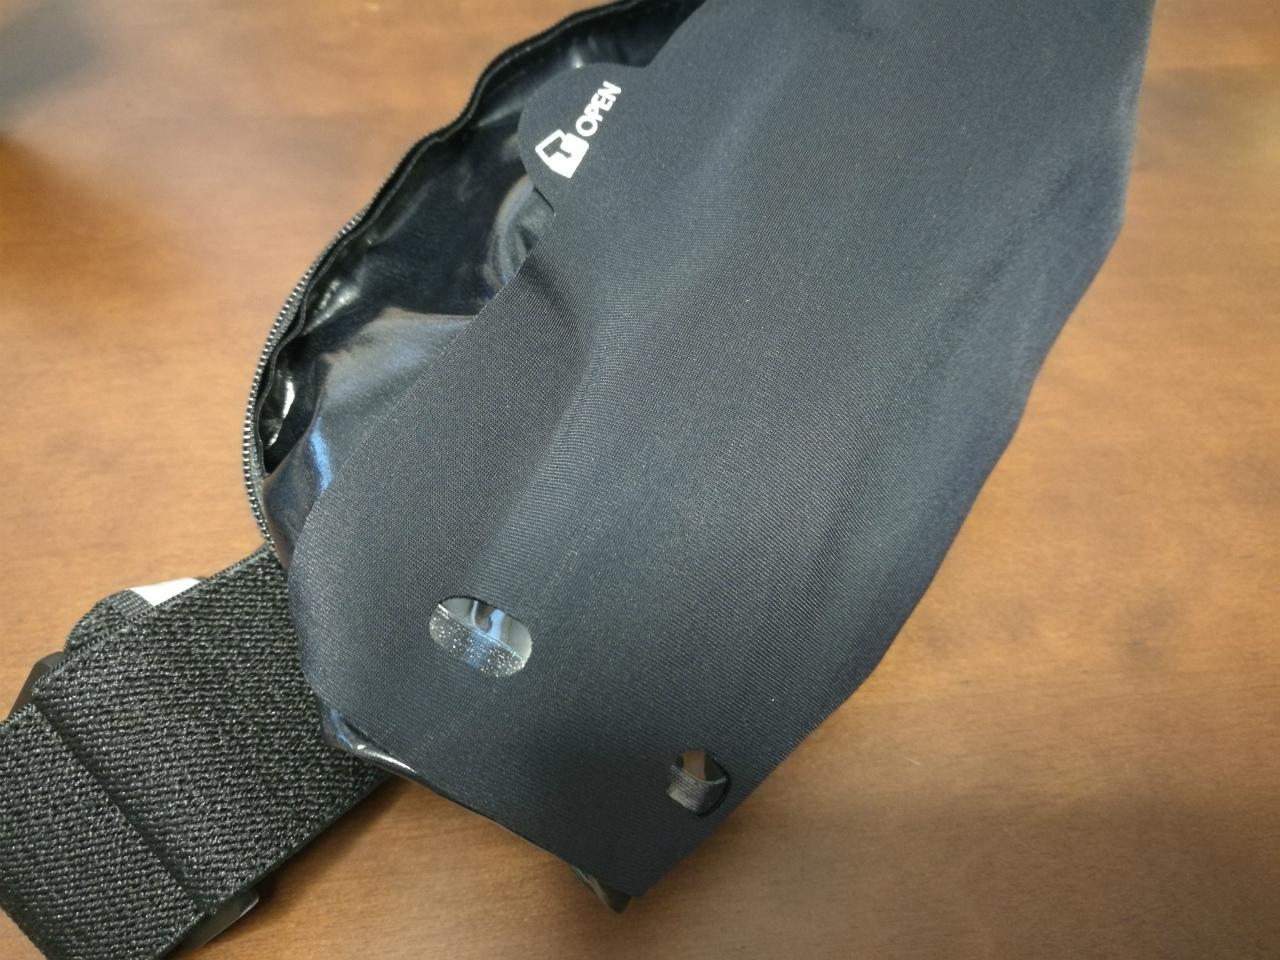 pr-anypro-sports-armband-15